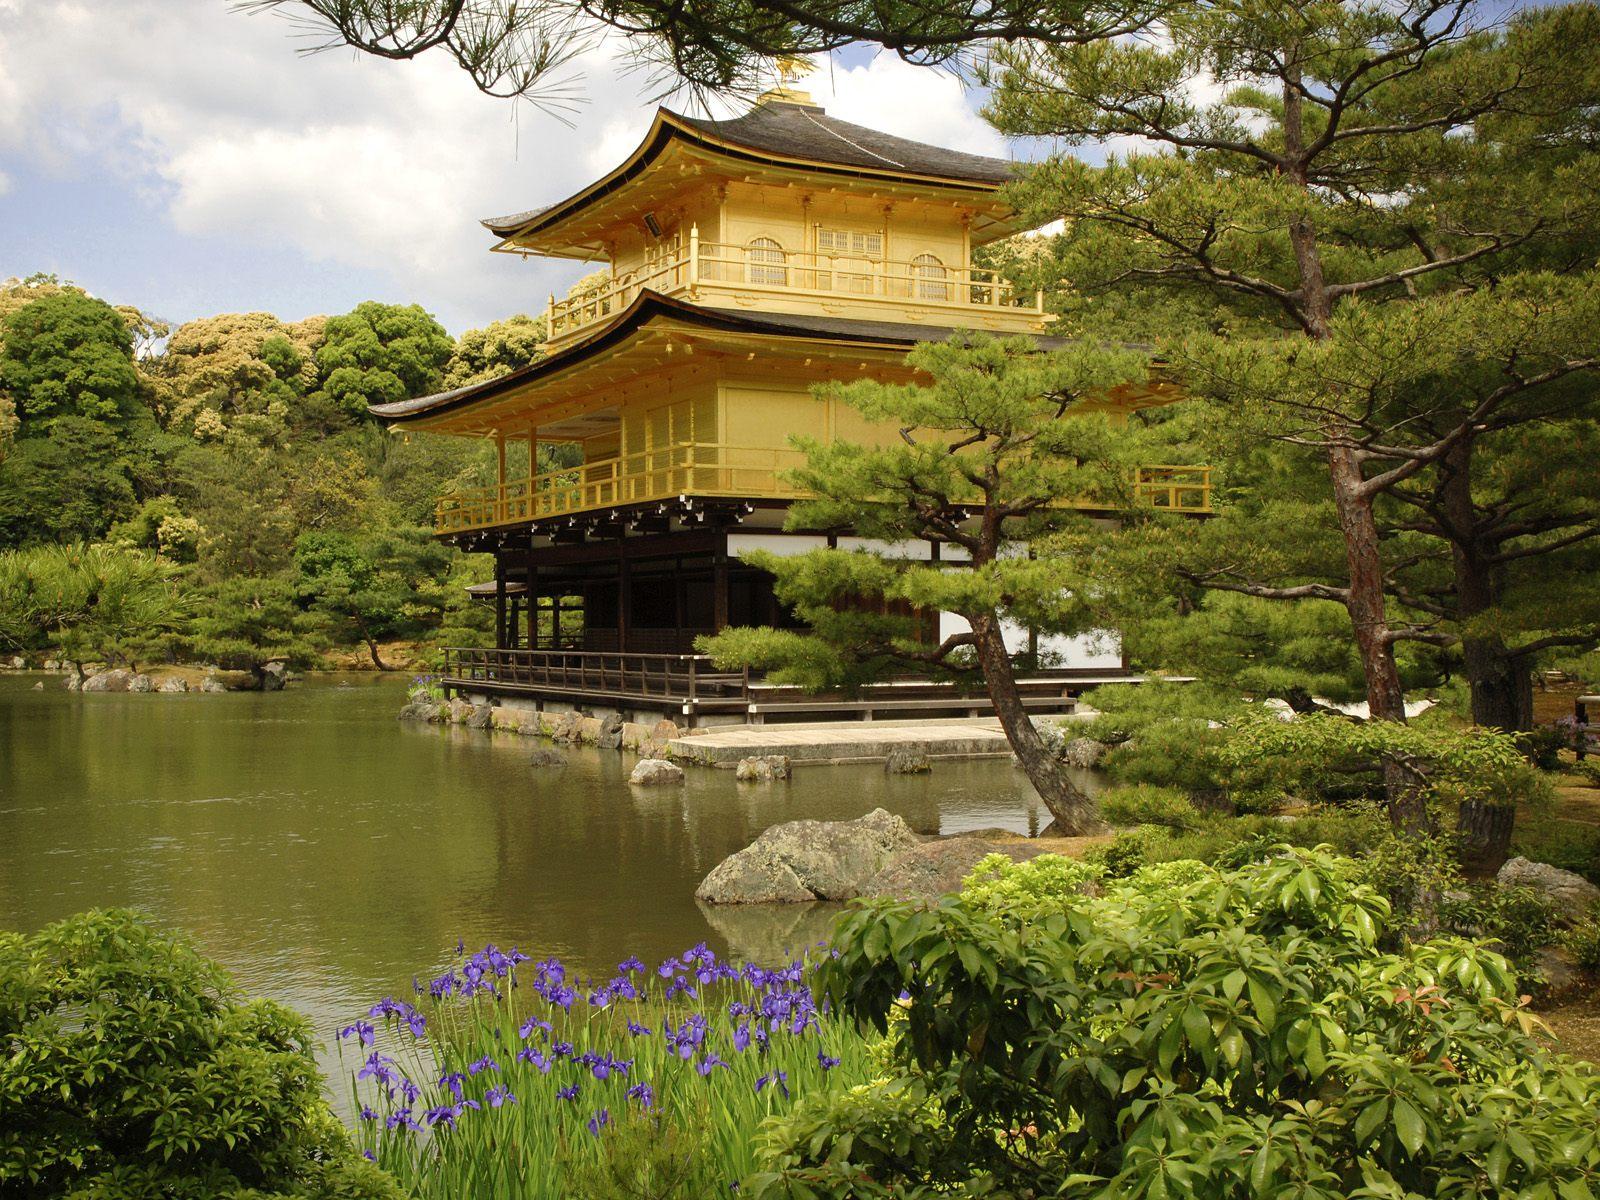 Japanese beuties